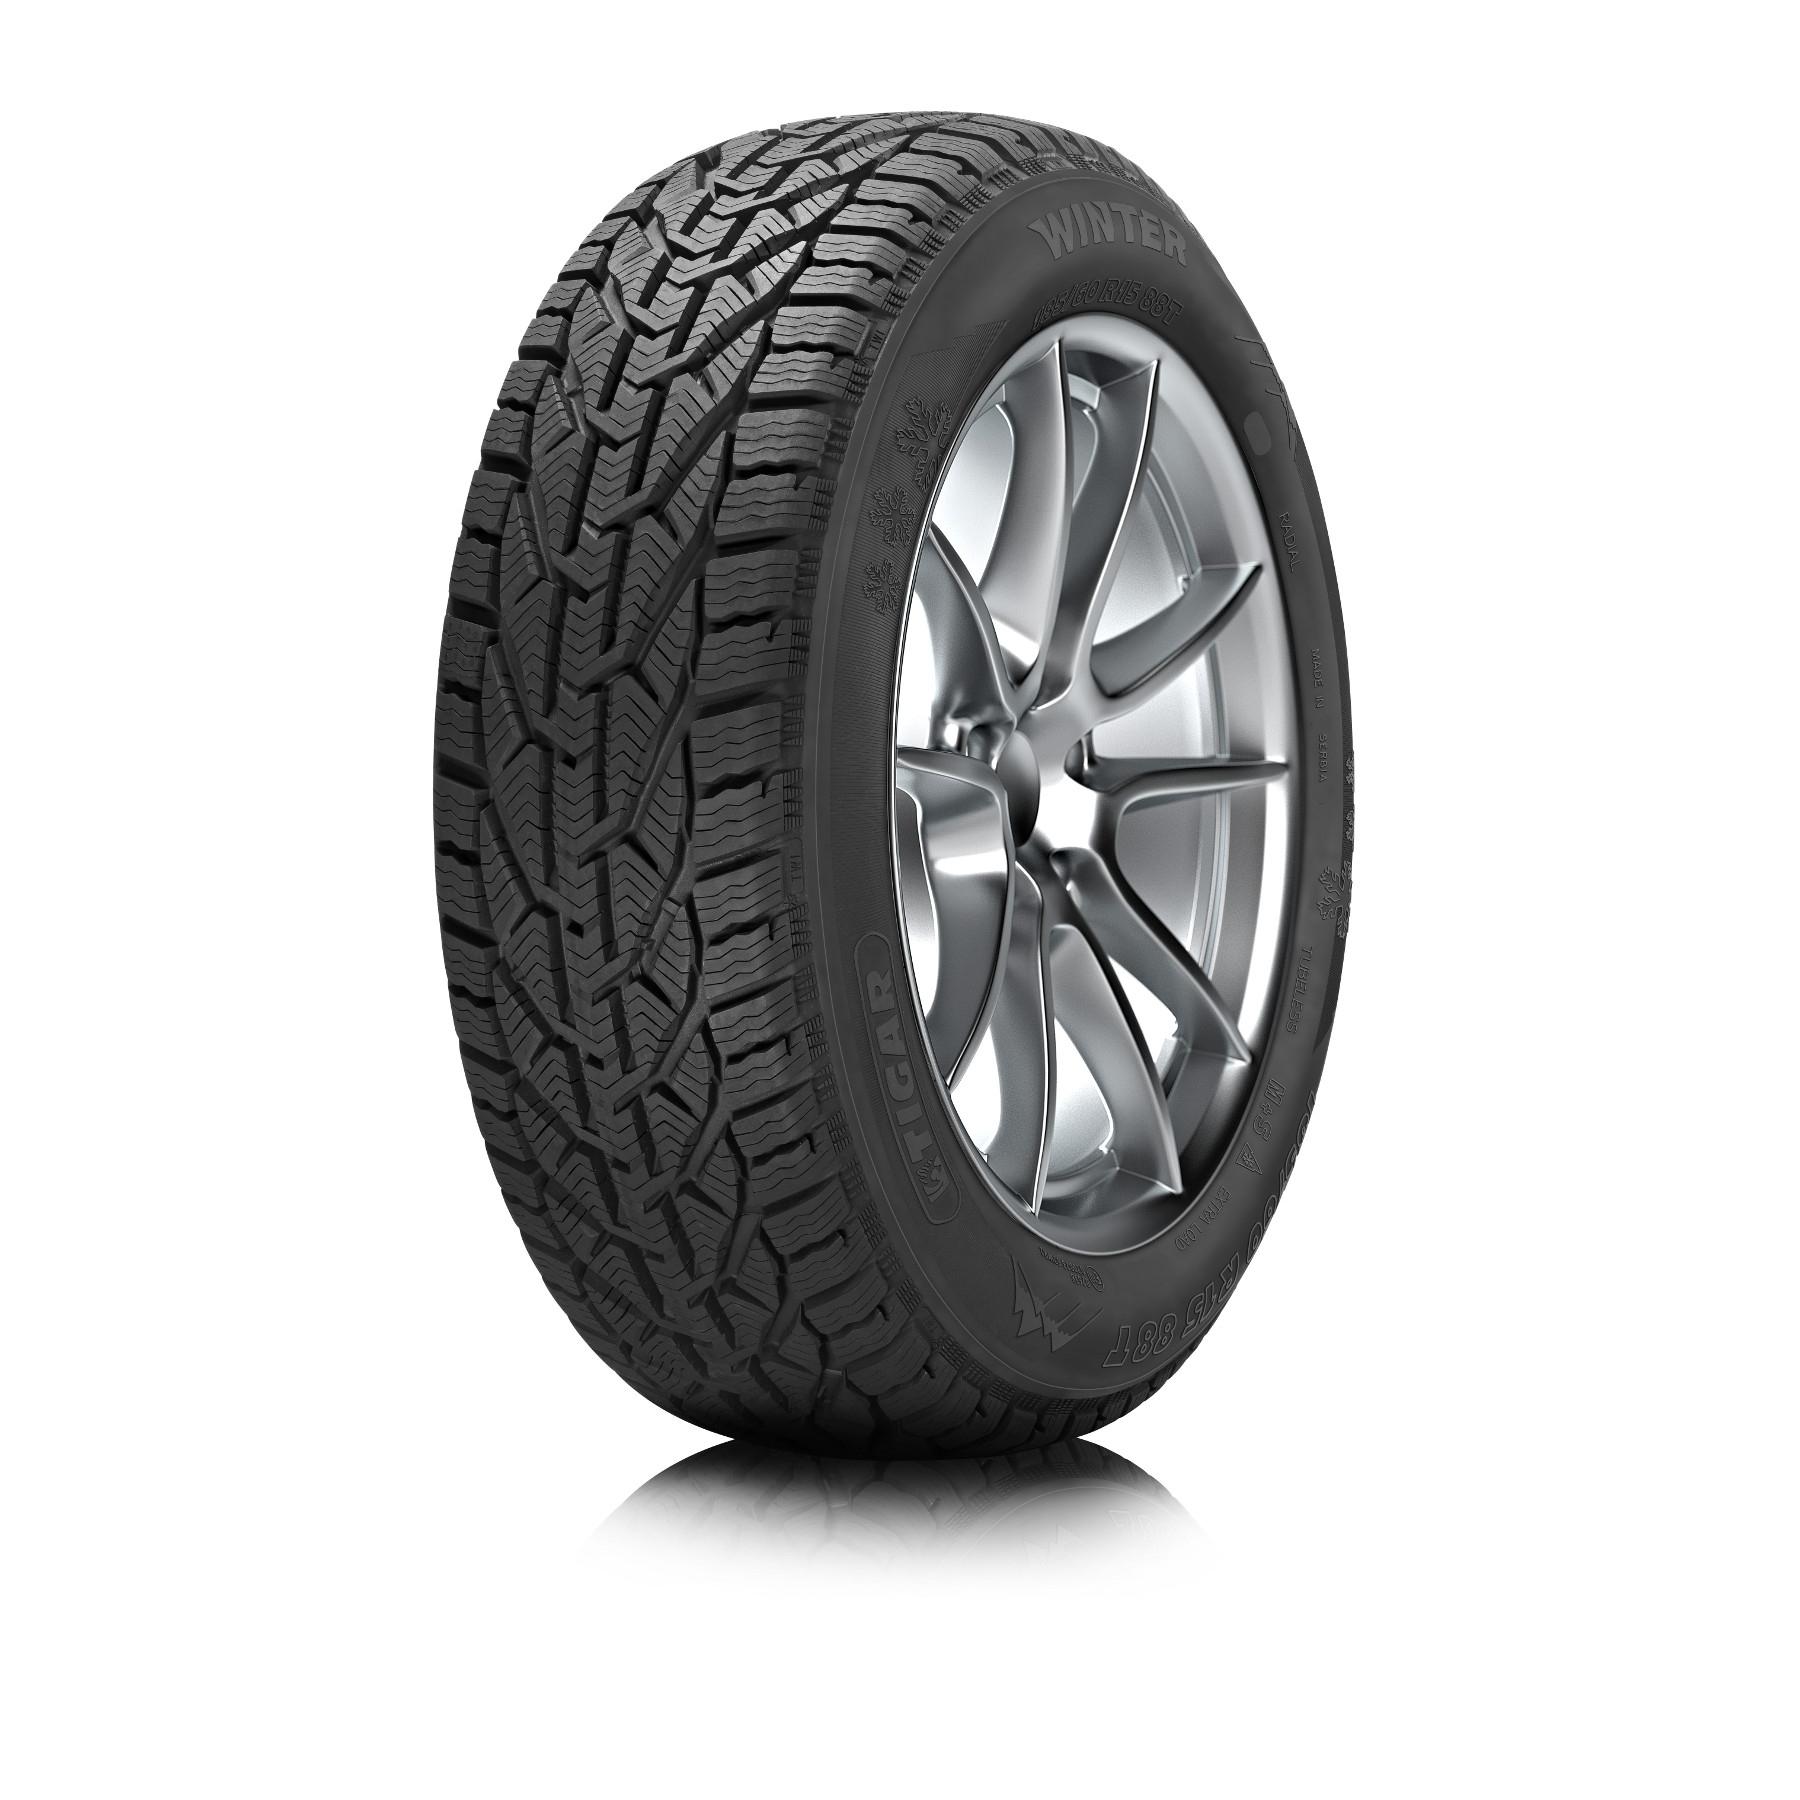 автомобильные шины Tigar Winter 215/40 R17 87V